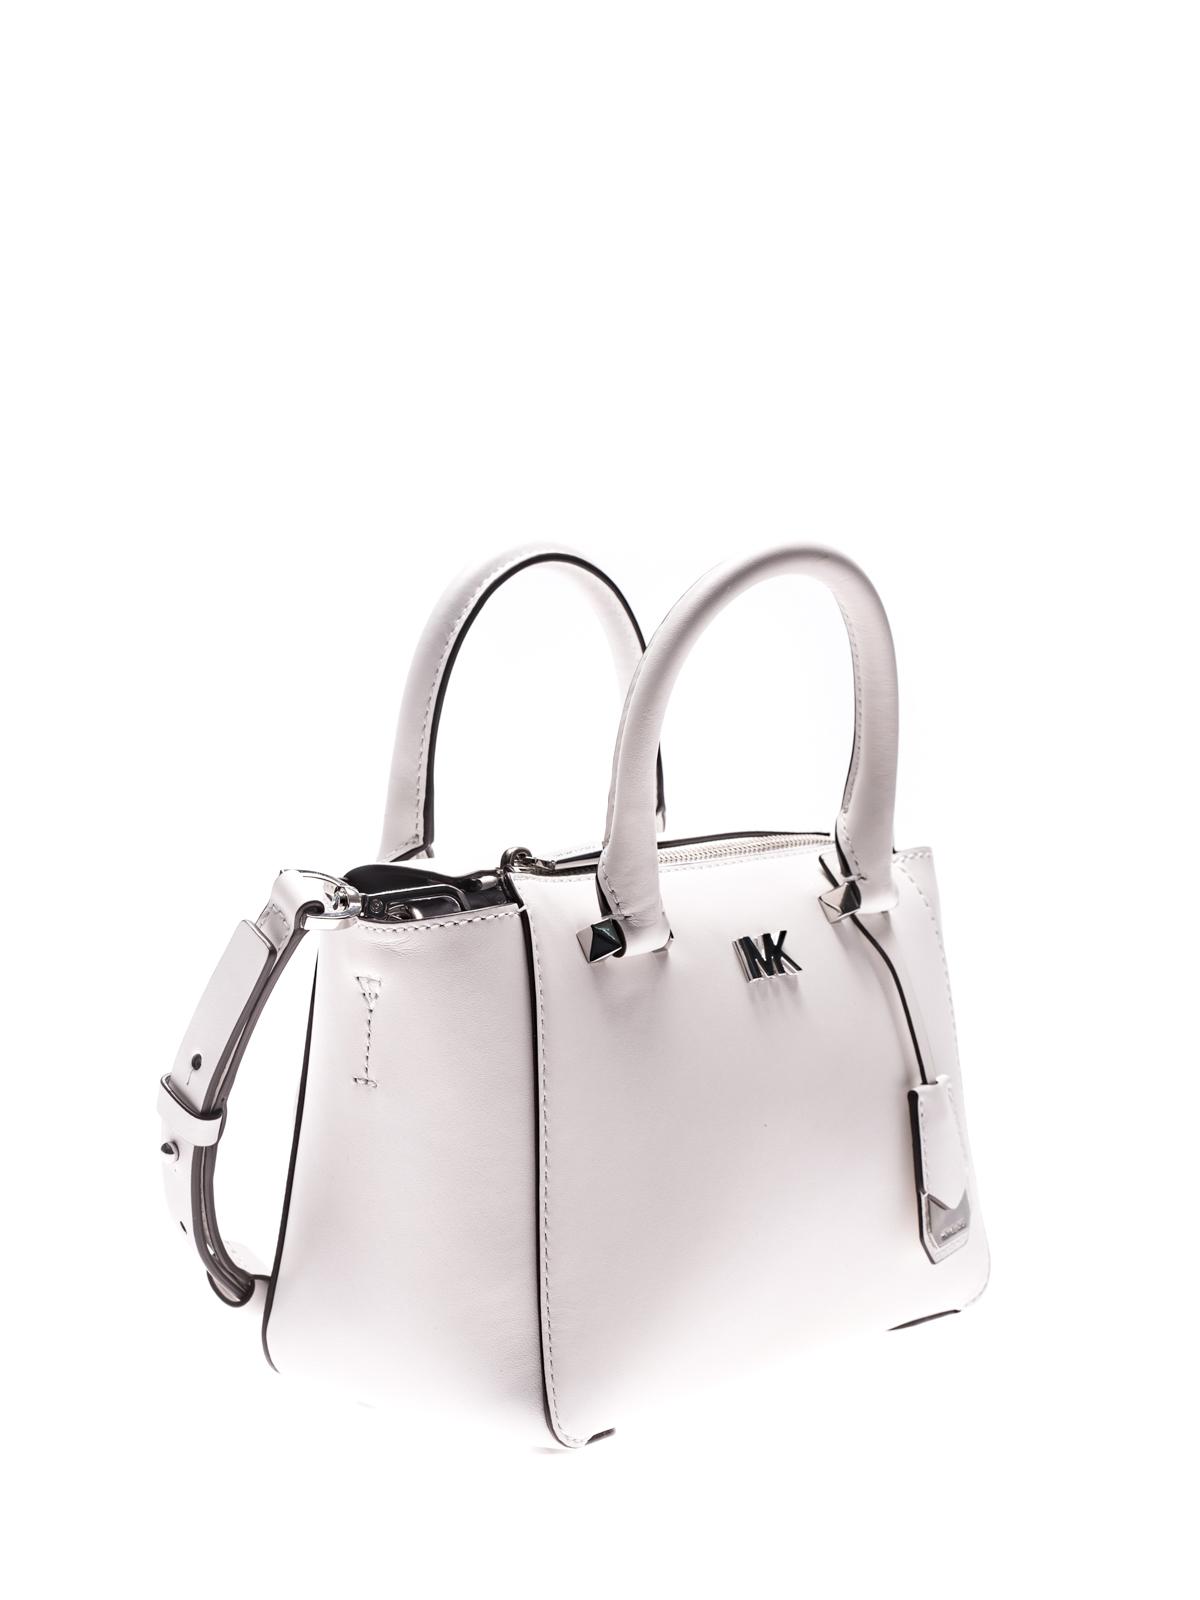 ea1e1177f05bdb MICHAEL KORS: cross body bags online - Nolita smooth leather bag